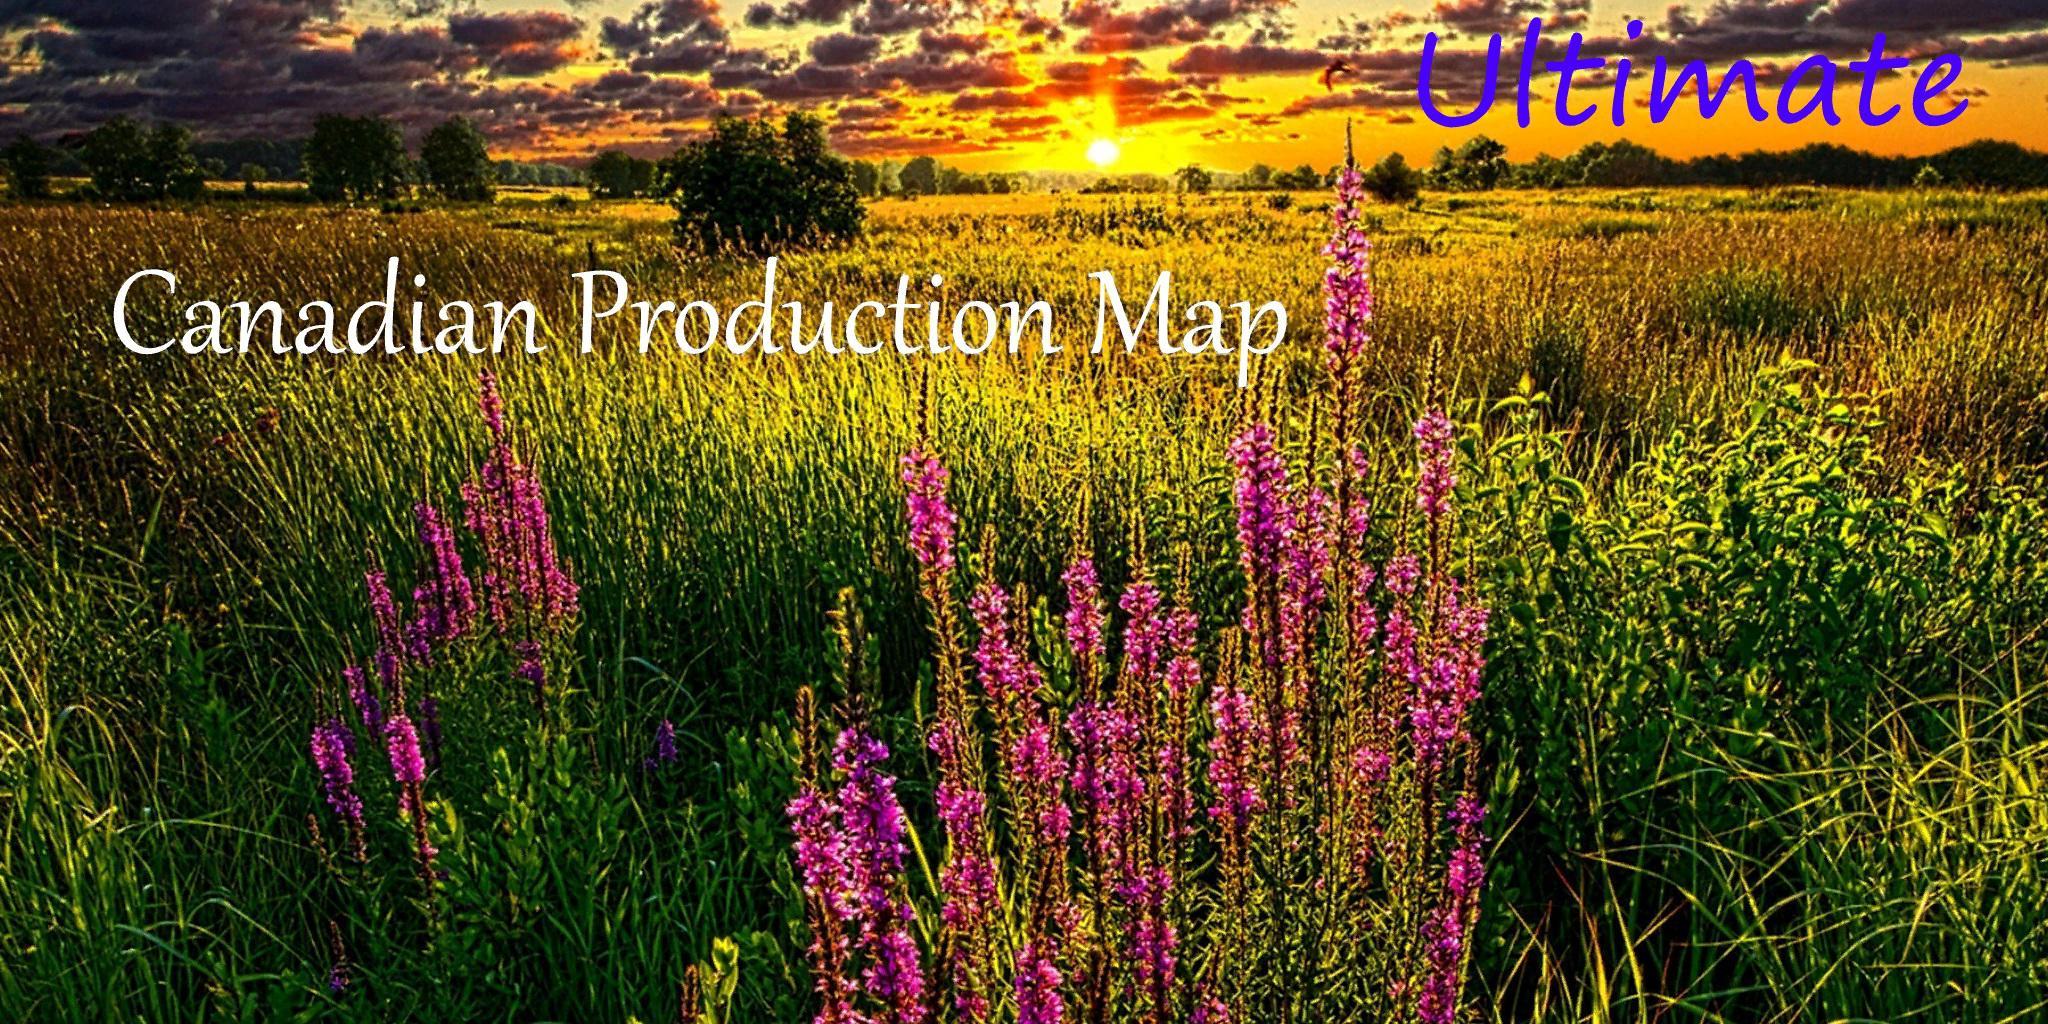 Fs 19 16x Map Canada CANADIAN PRODUCTION MAP ULTIMATE V3.0 | FS19 mod | FS19.net